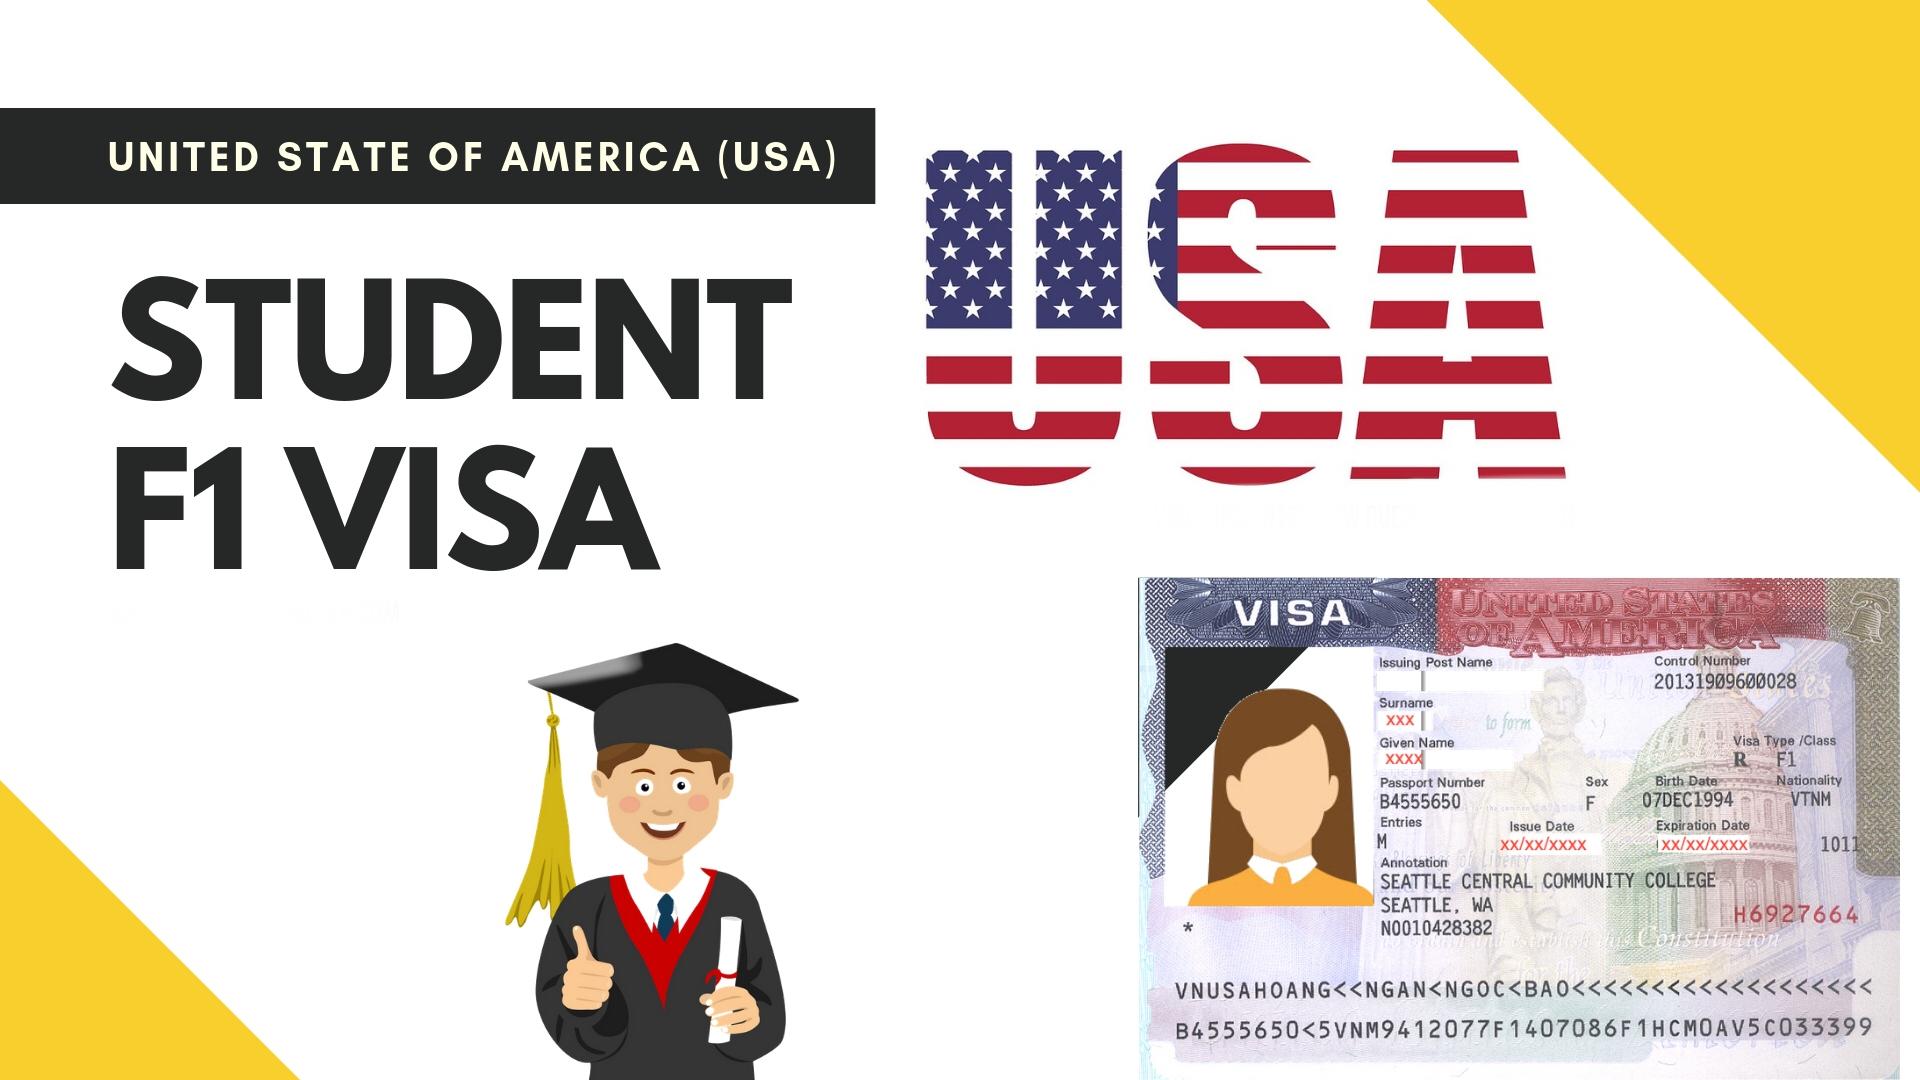 Limited number of F1 student visa renewal applications | U.S. Embassy in Azerbaijan